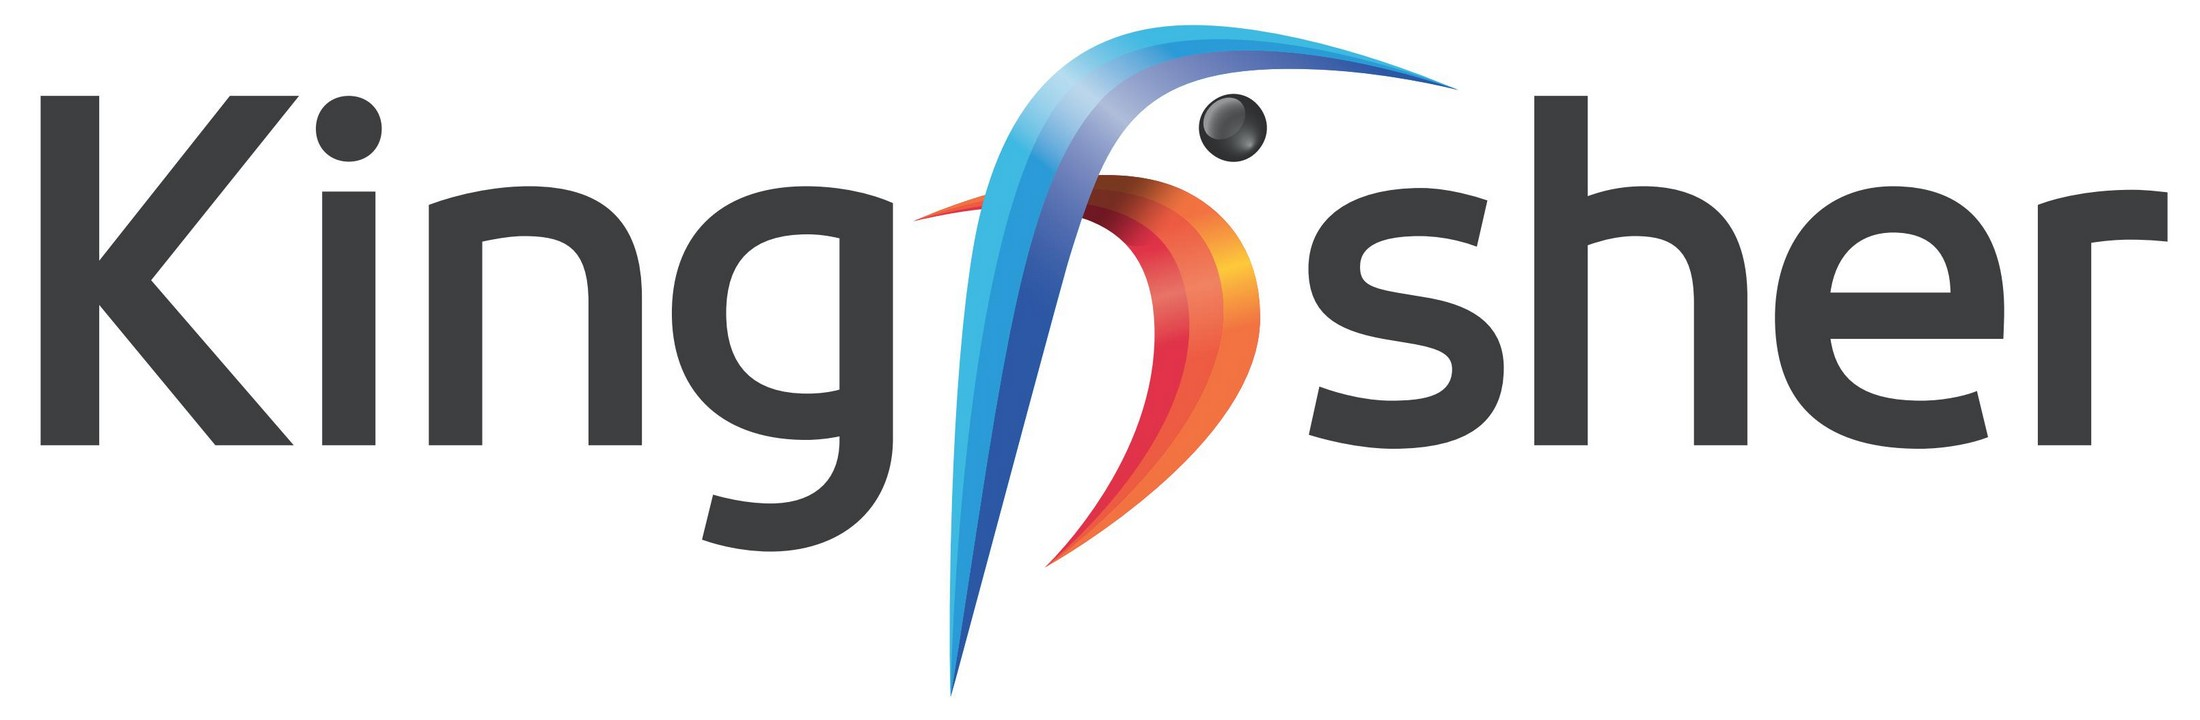 Kingfisher plc logo